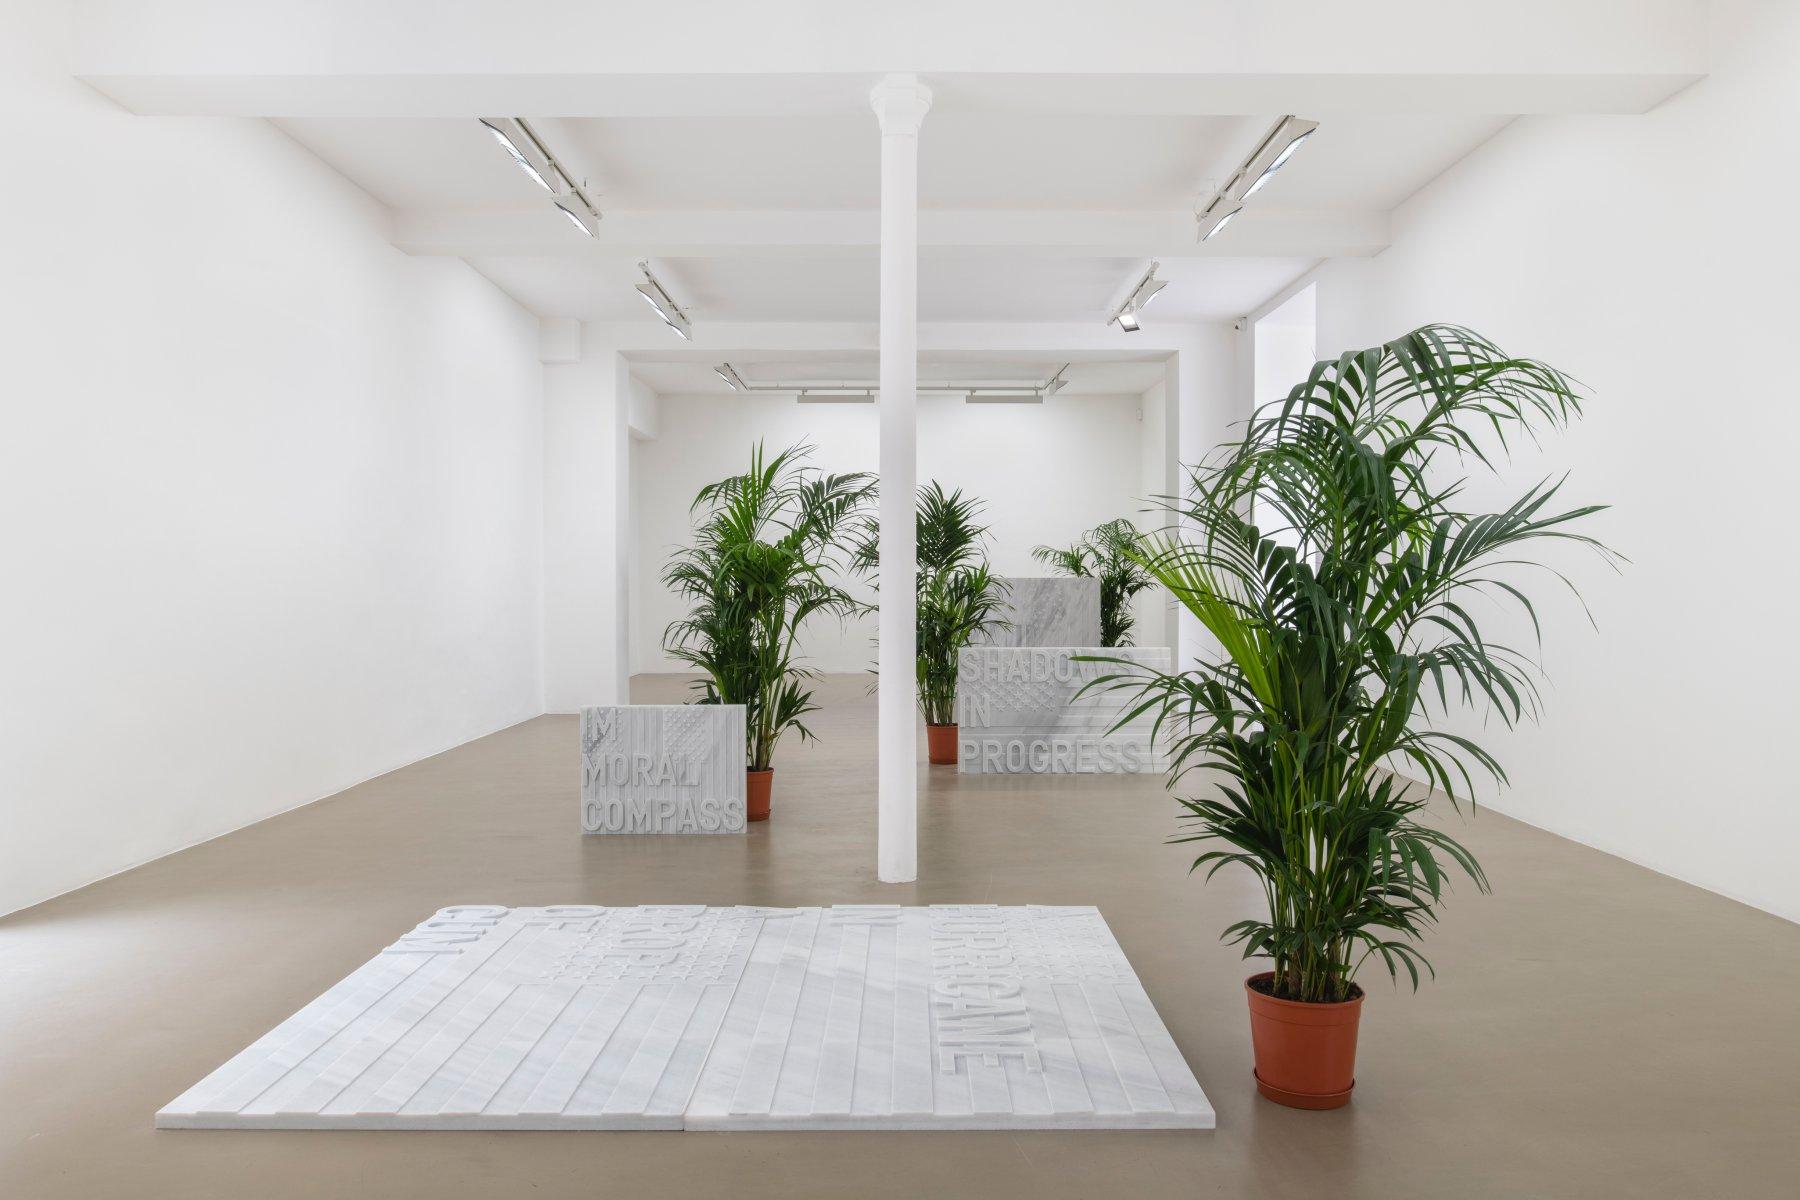 Galerie Chantal Crousel Rirkrit Tiravanija 1